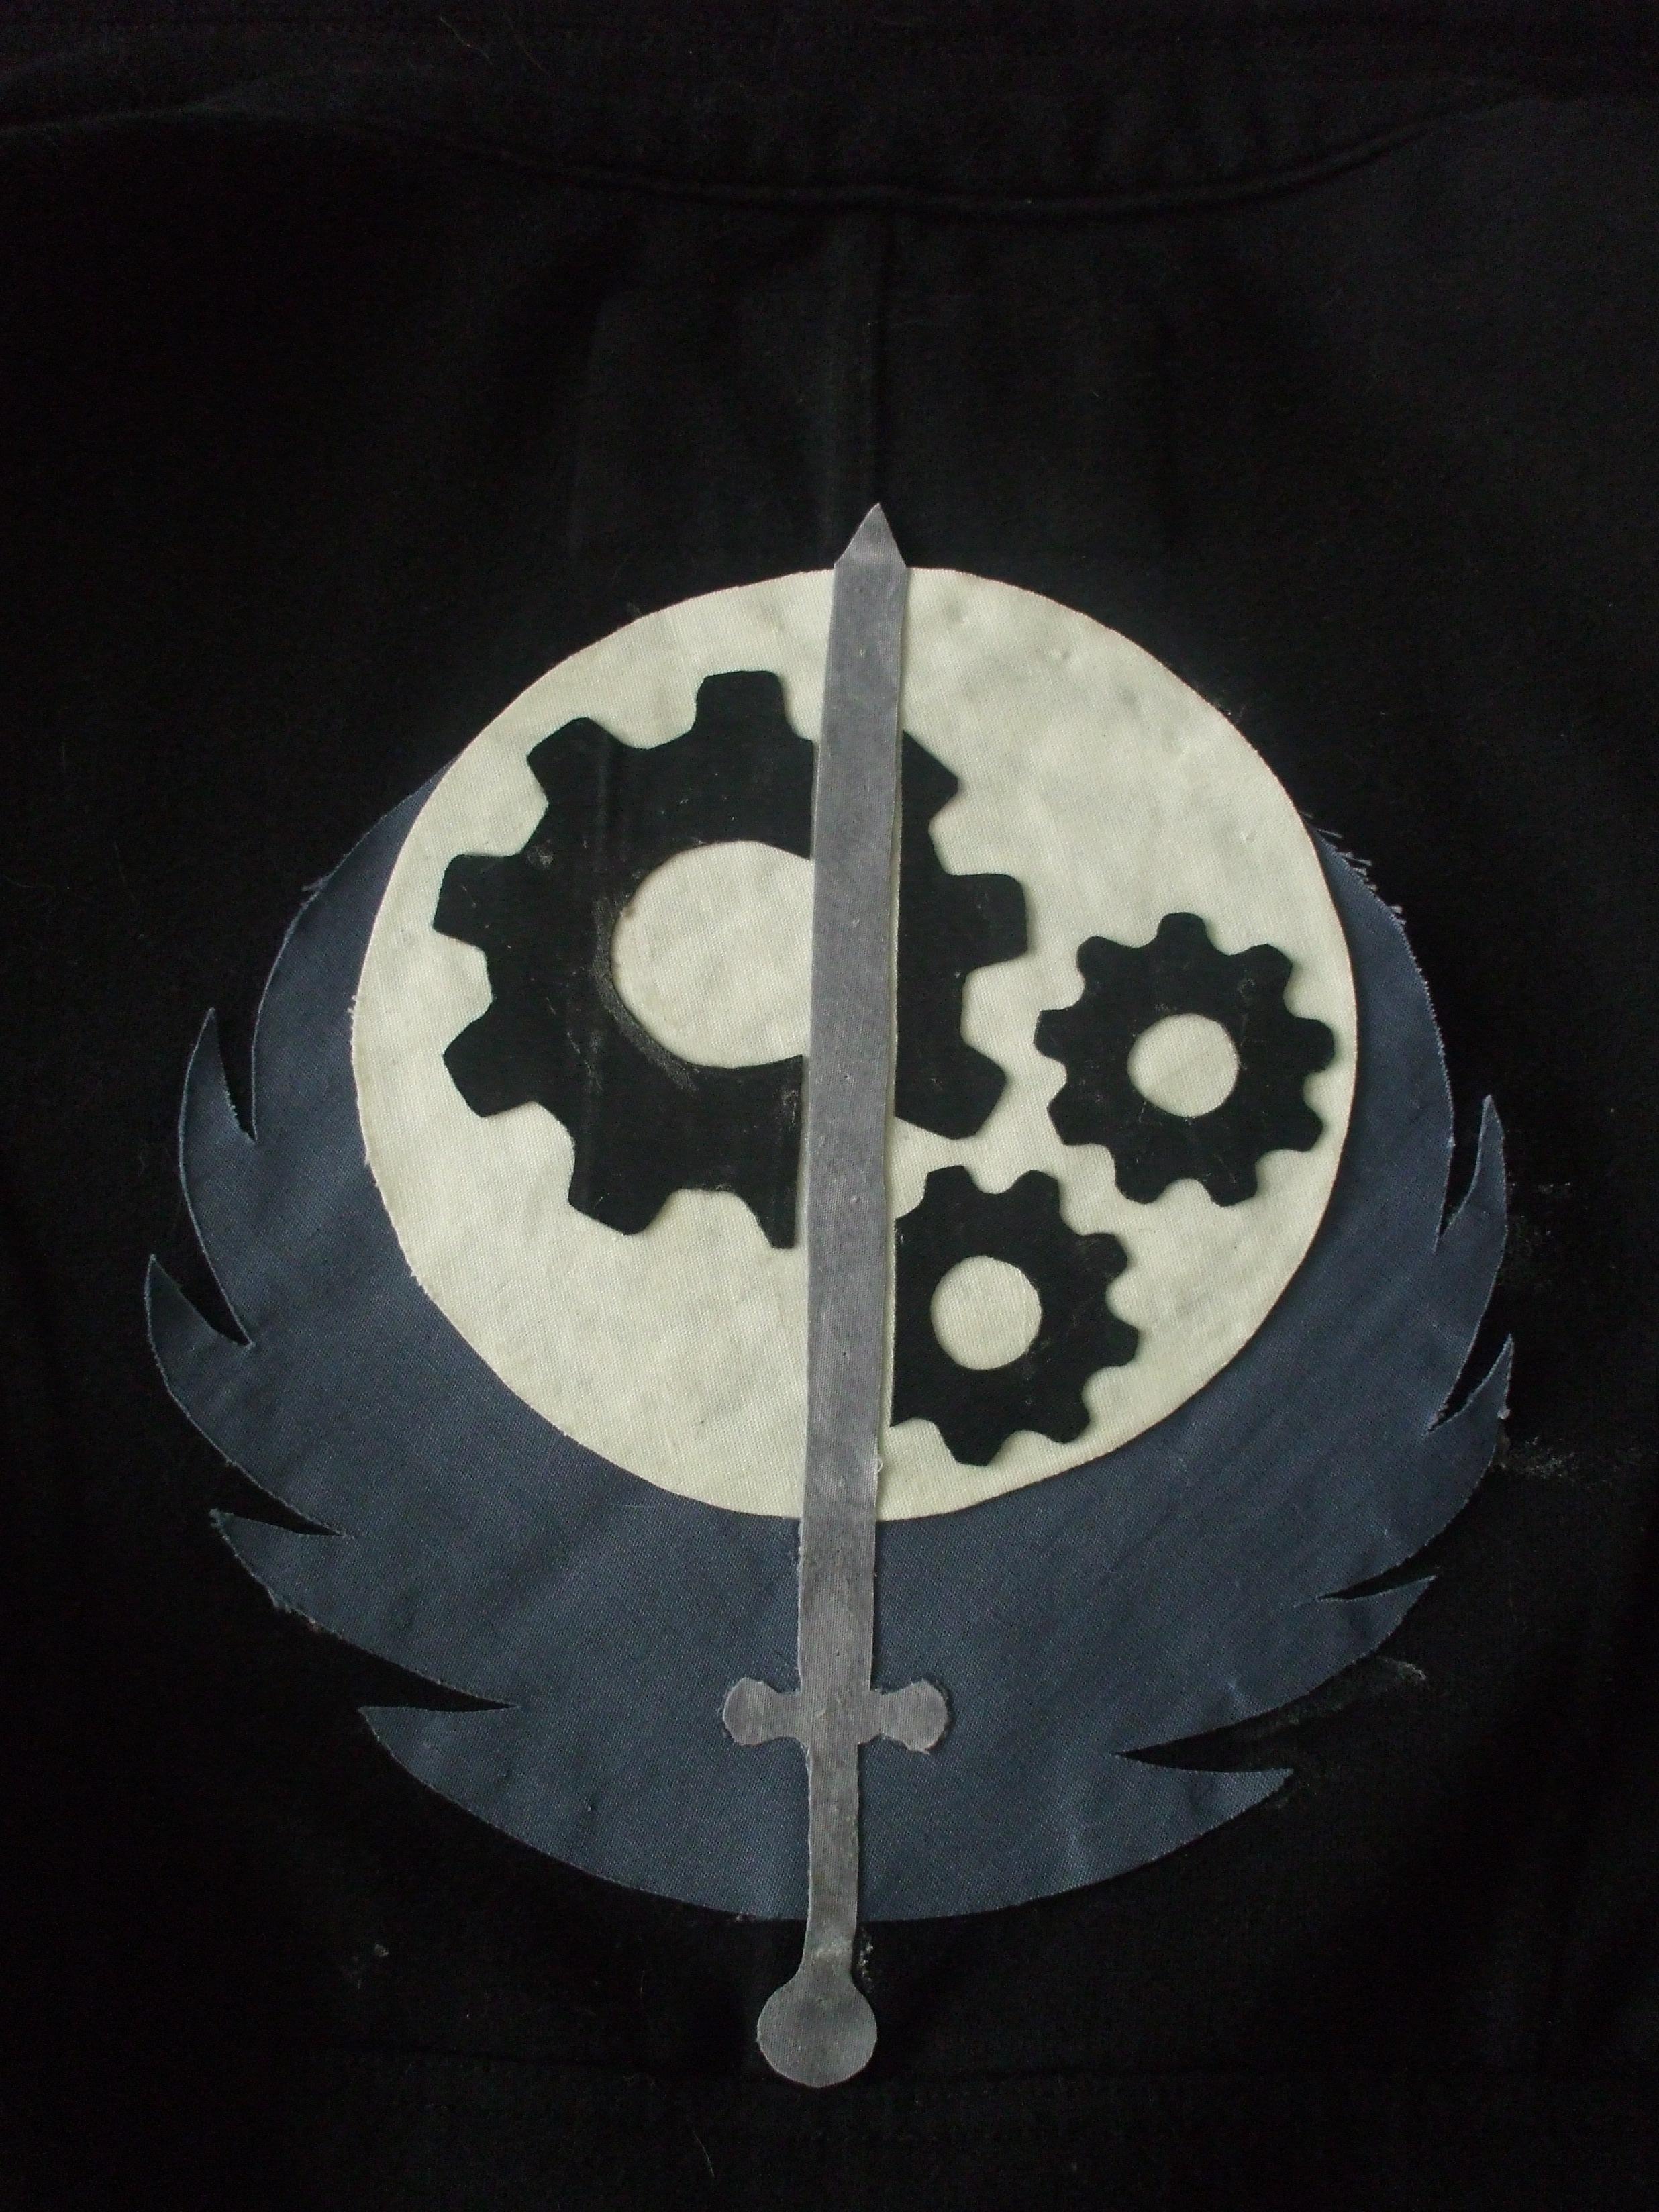 brotherhood of steel by ladydevimon on deviantart